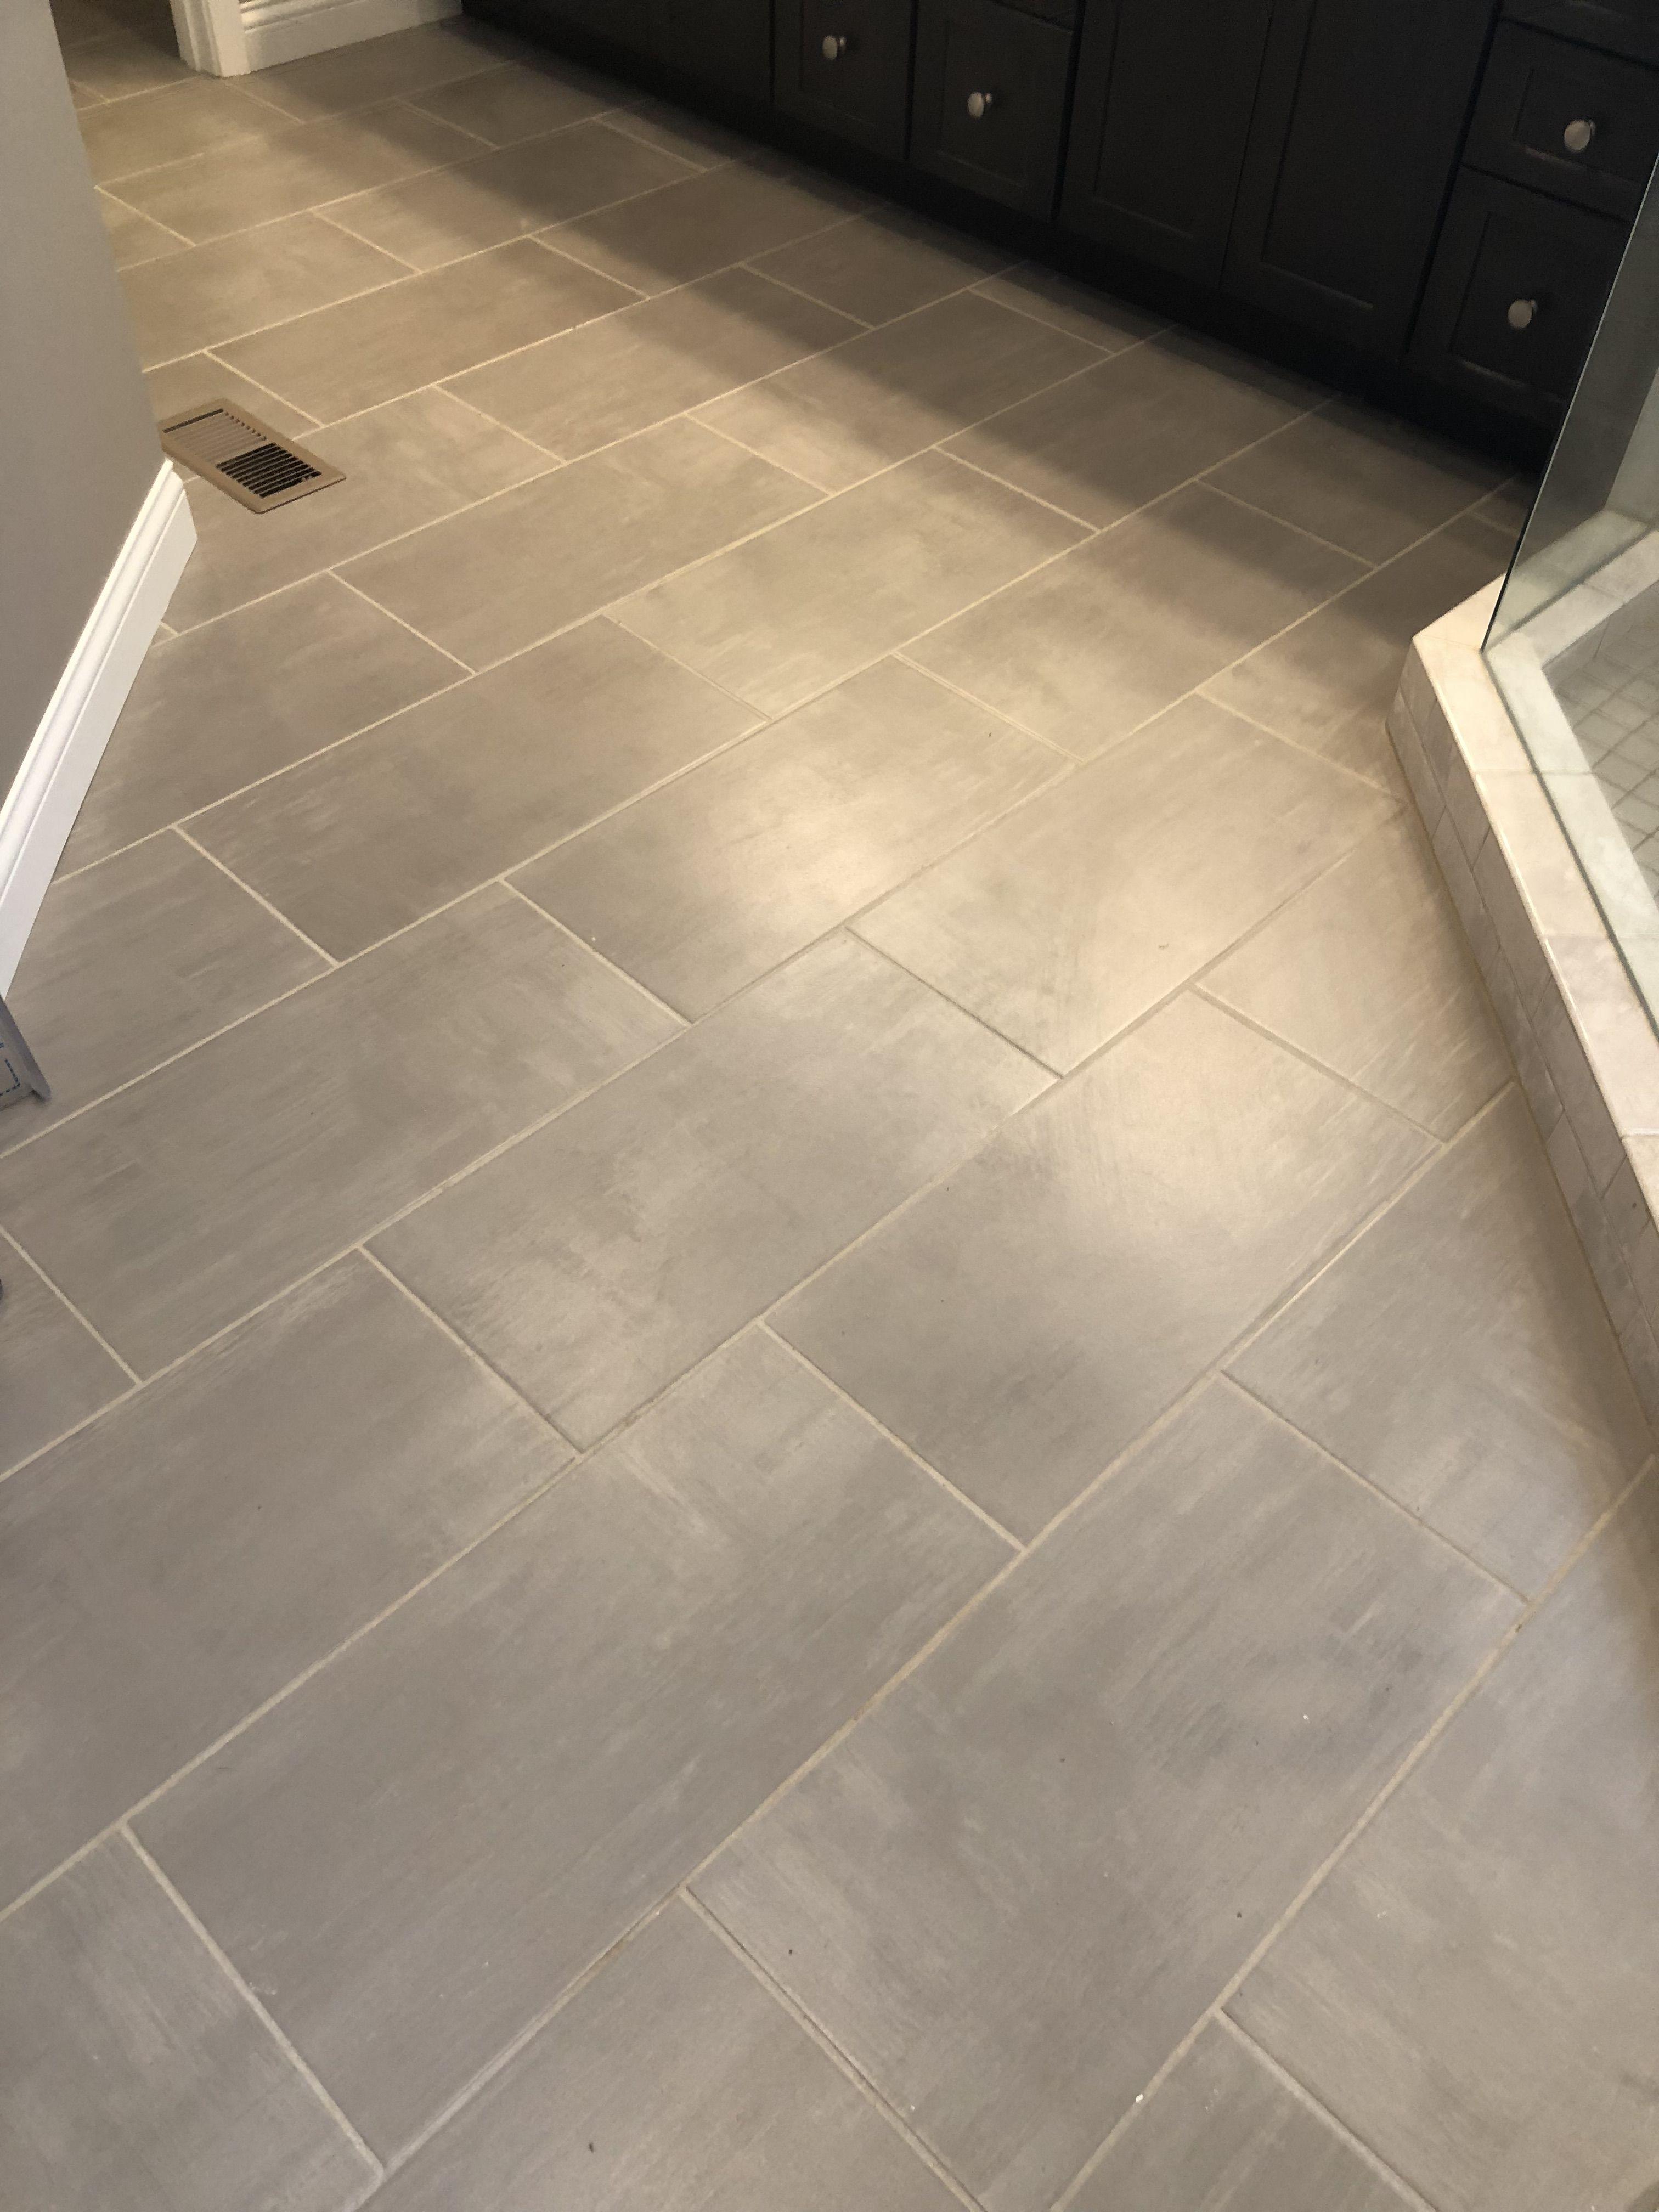 Skybridge 12x24 Gray Floor Tile Installed Brick Joint Grey